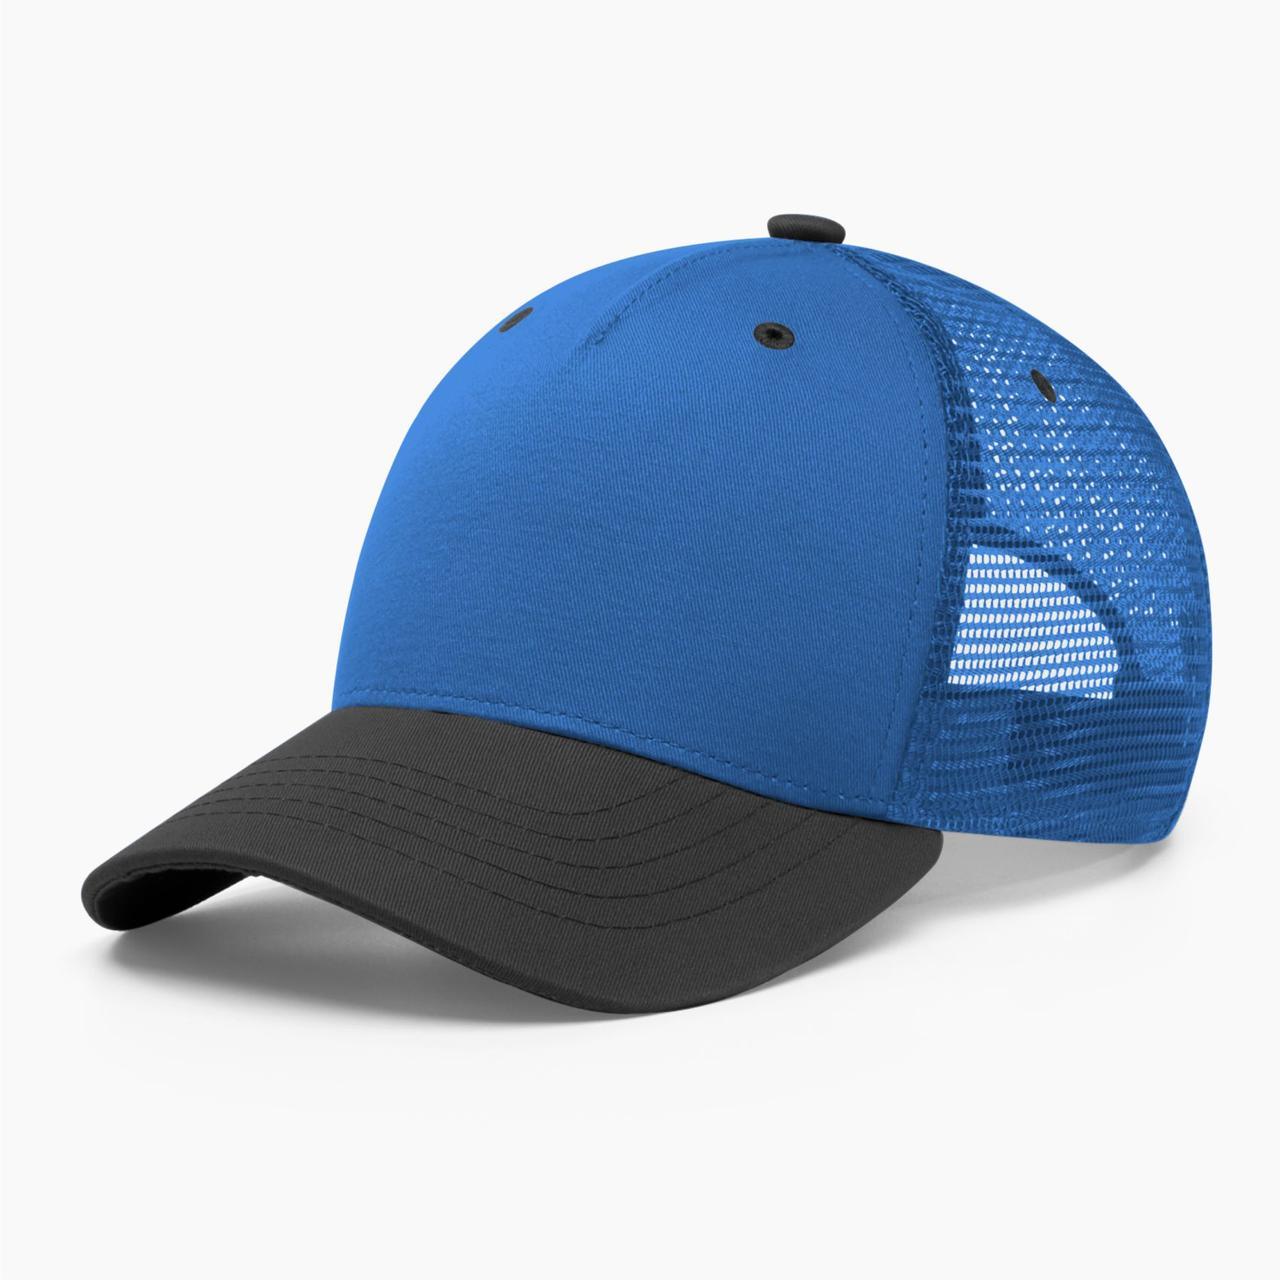 Кепка бейсболка Тракер INAL blank S / 53-54 RU Синий 74253